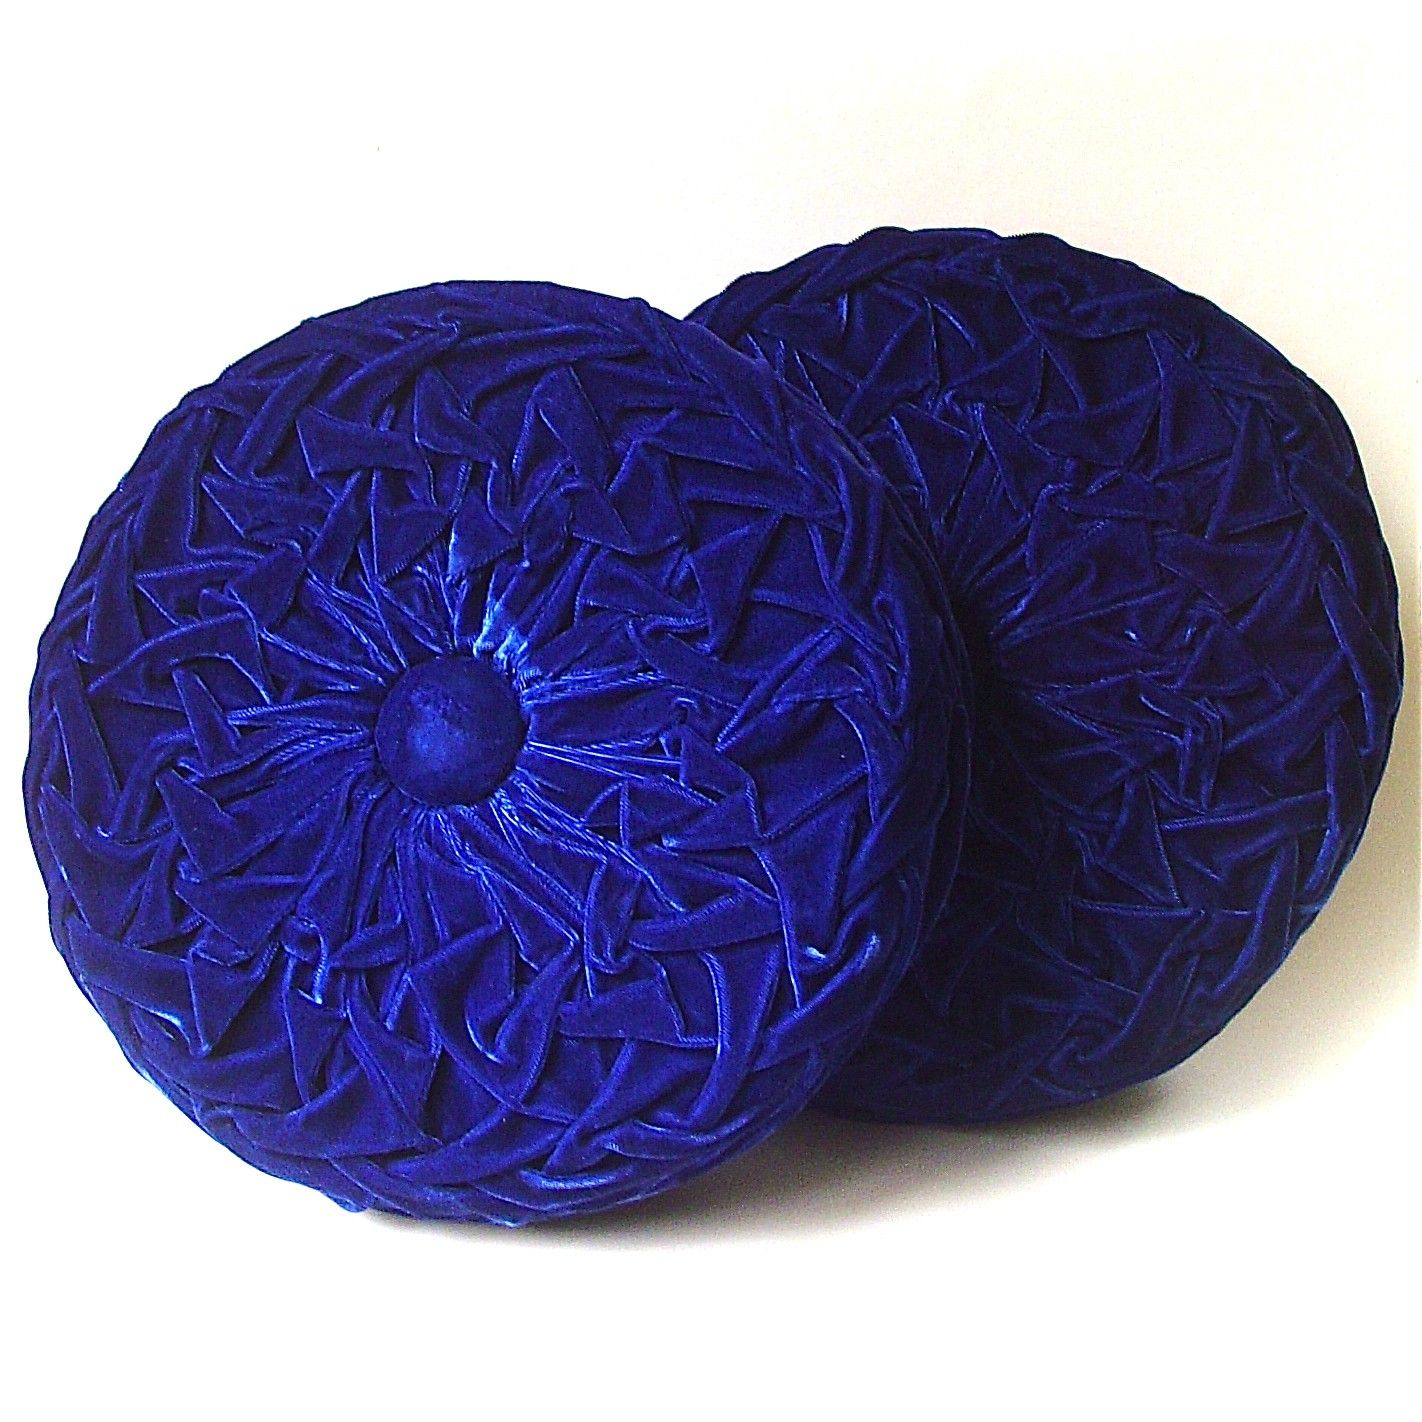 Vintage Round Royal Blue Velveteen Smocked Pillows In 2019